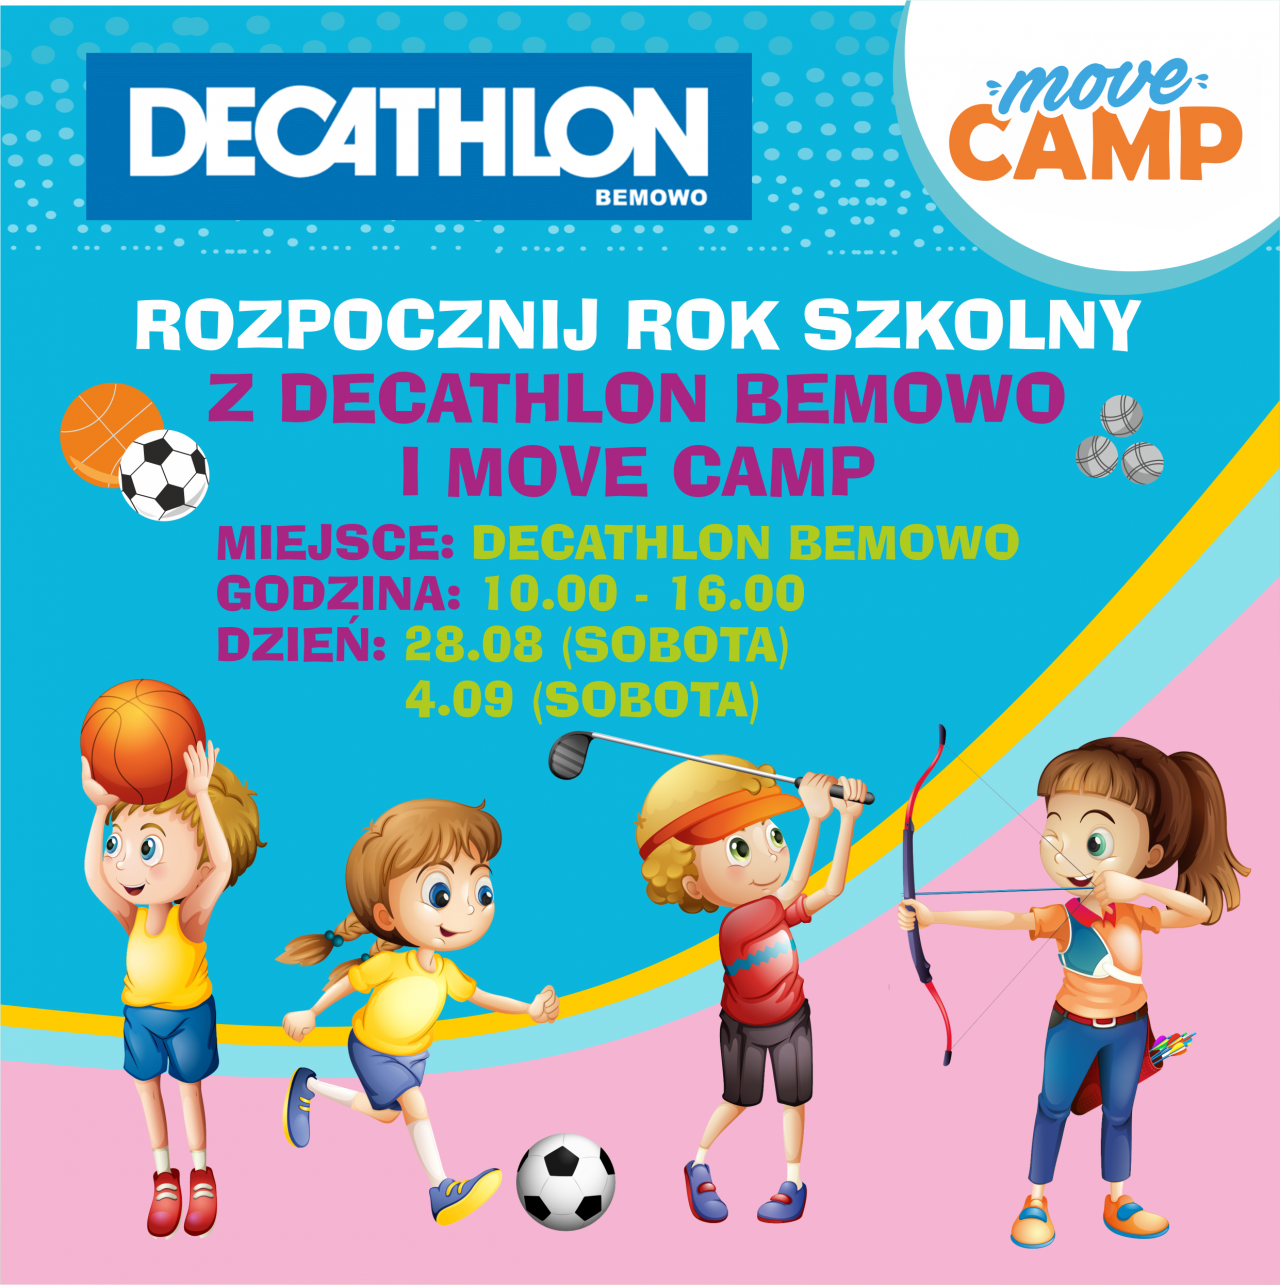 Decathlon-Event-IG-1280x1285.png